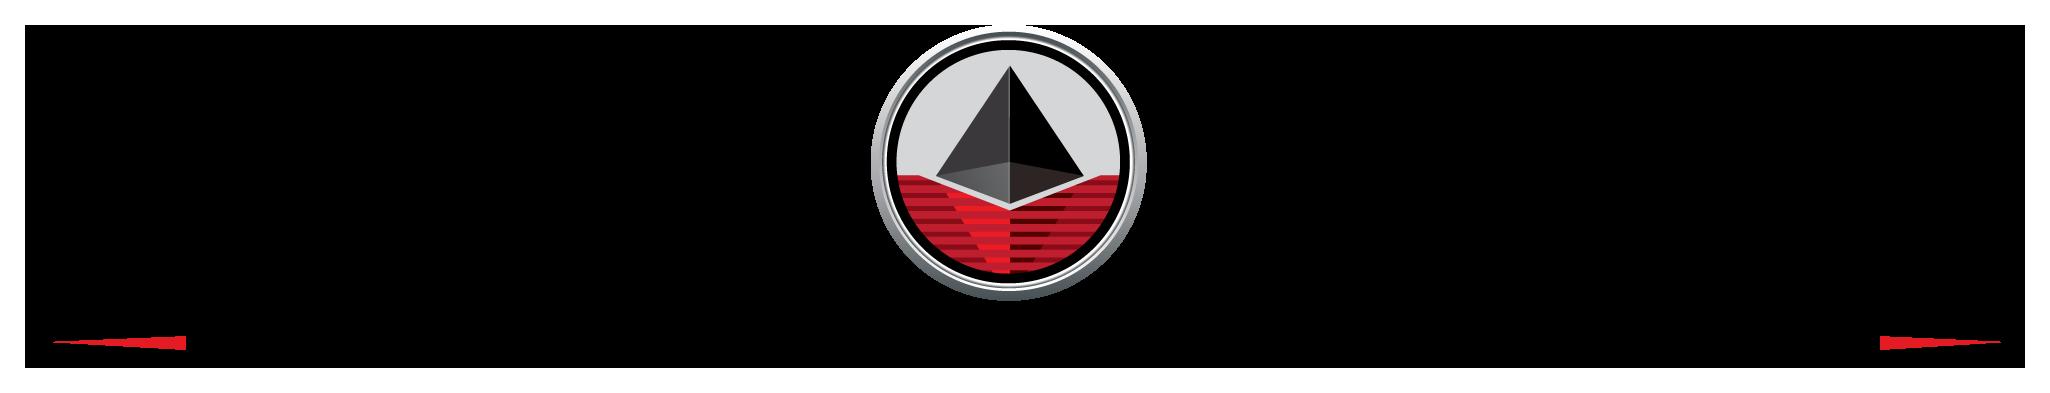 Simons_Agency_Logo_2017_-_horizontal2_-_wTag_-_black_letters.png